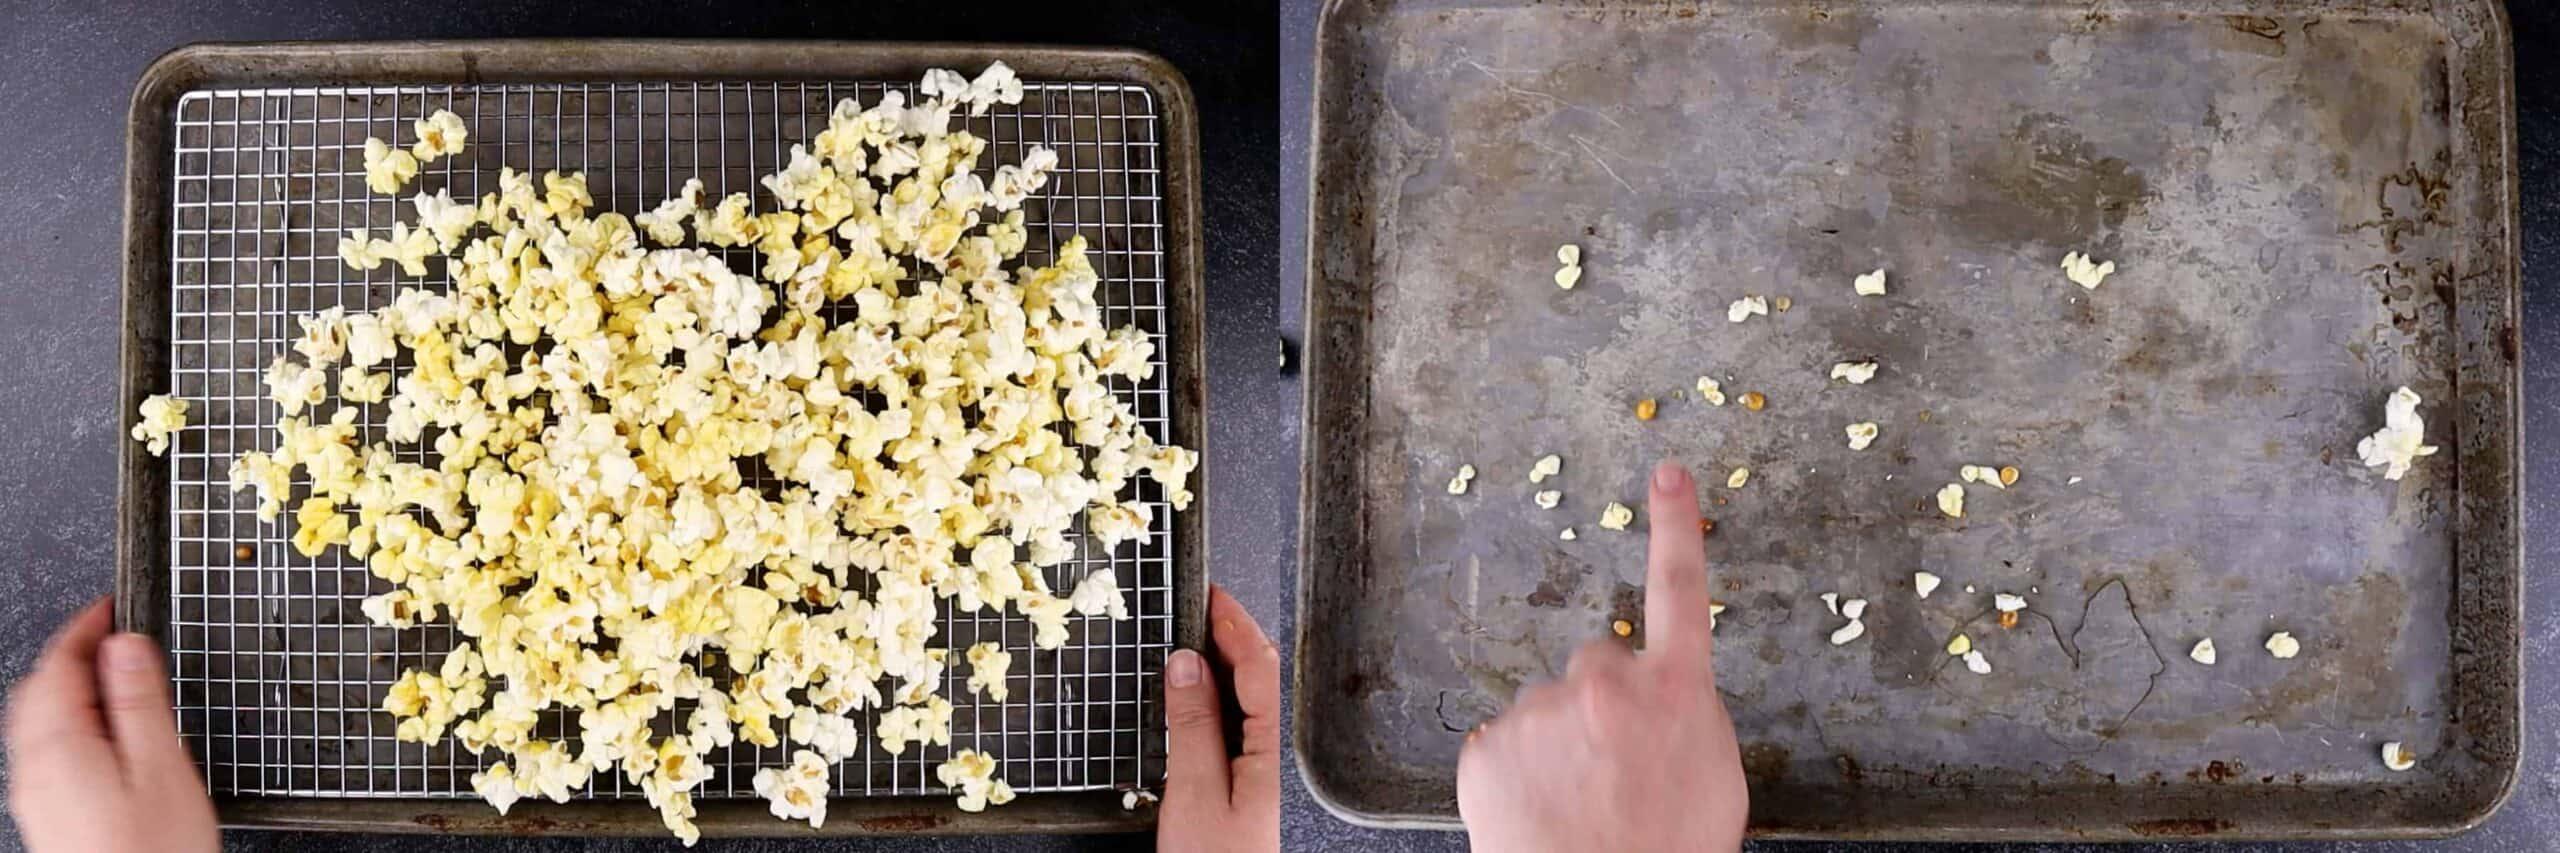 removing kernels from popcorn